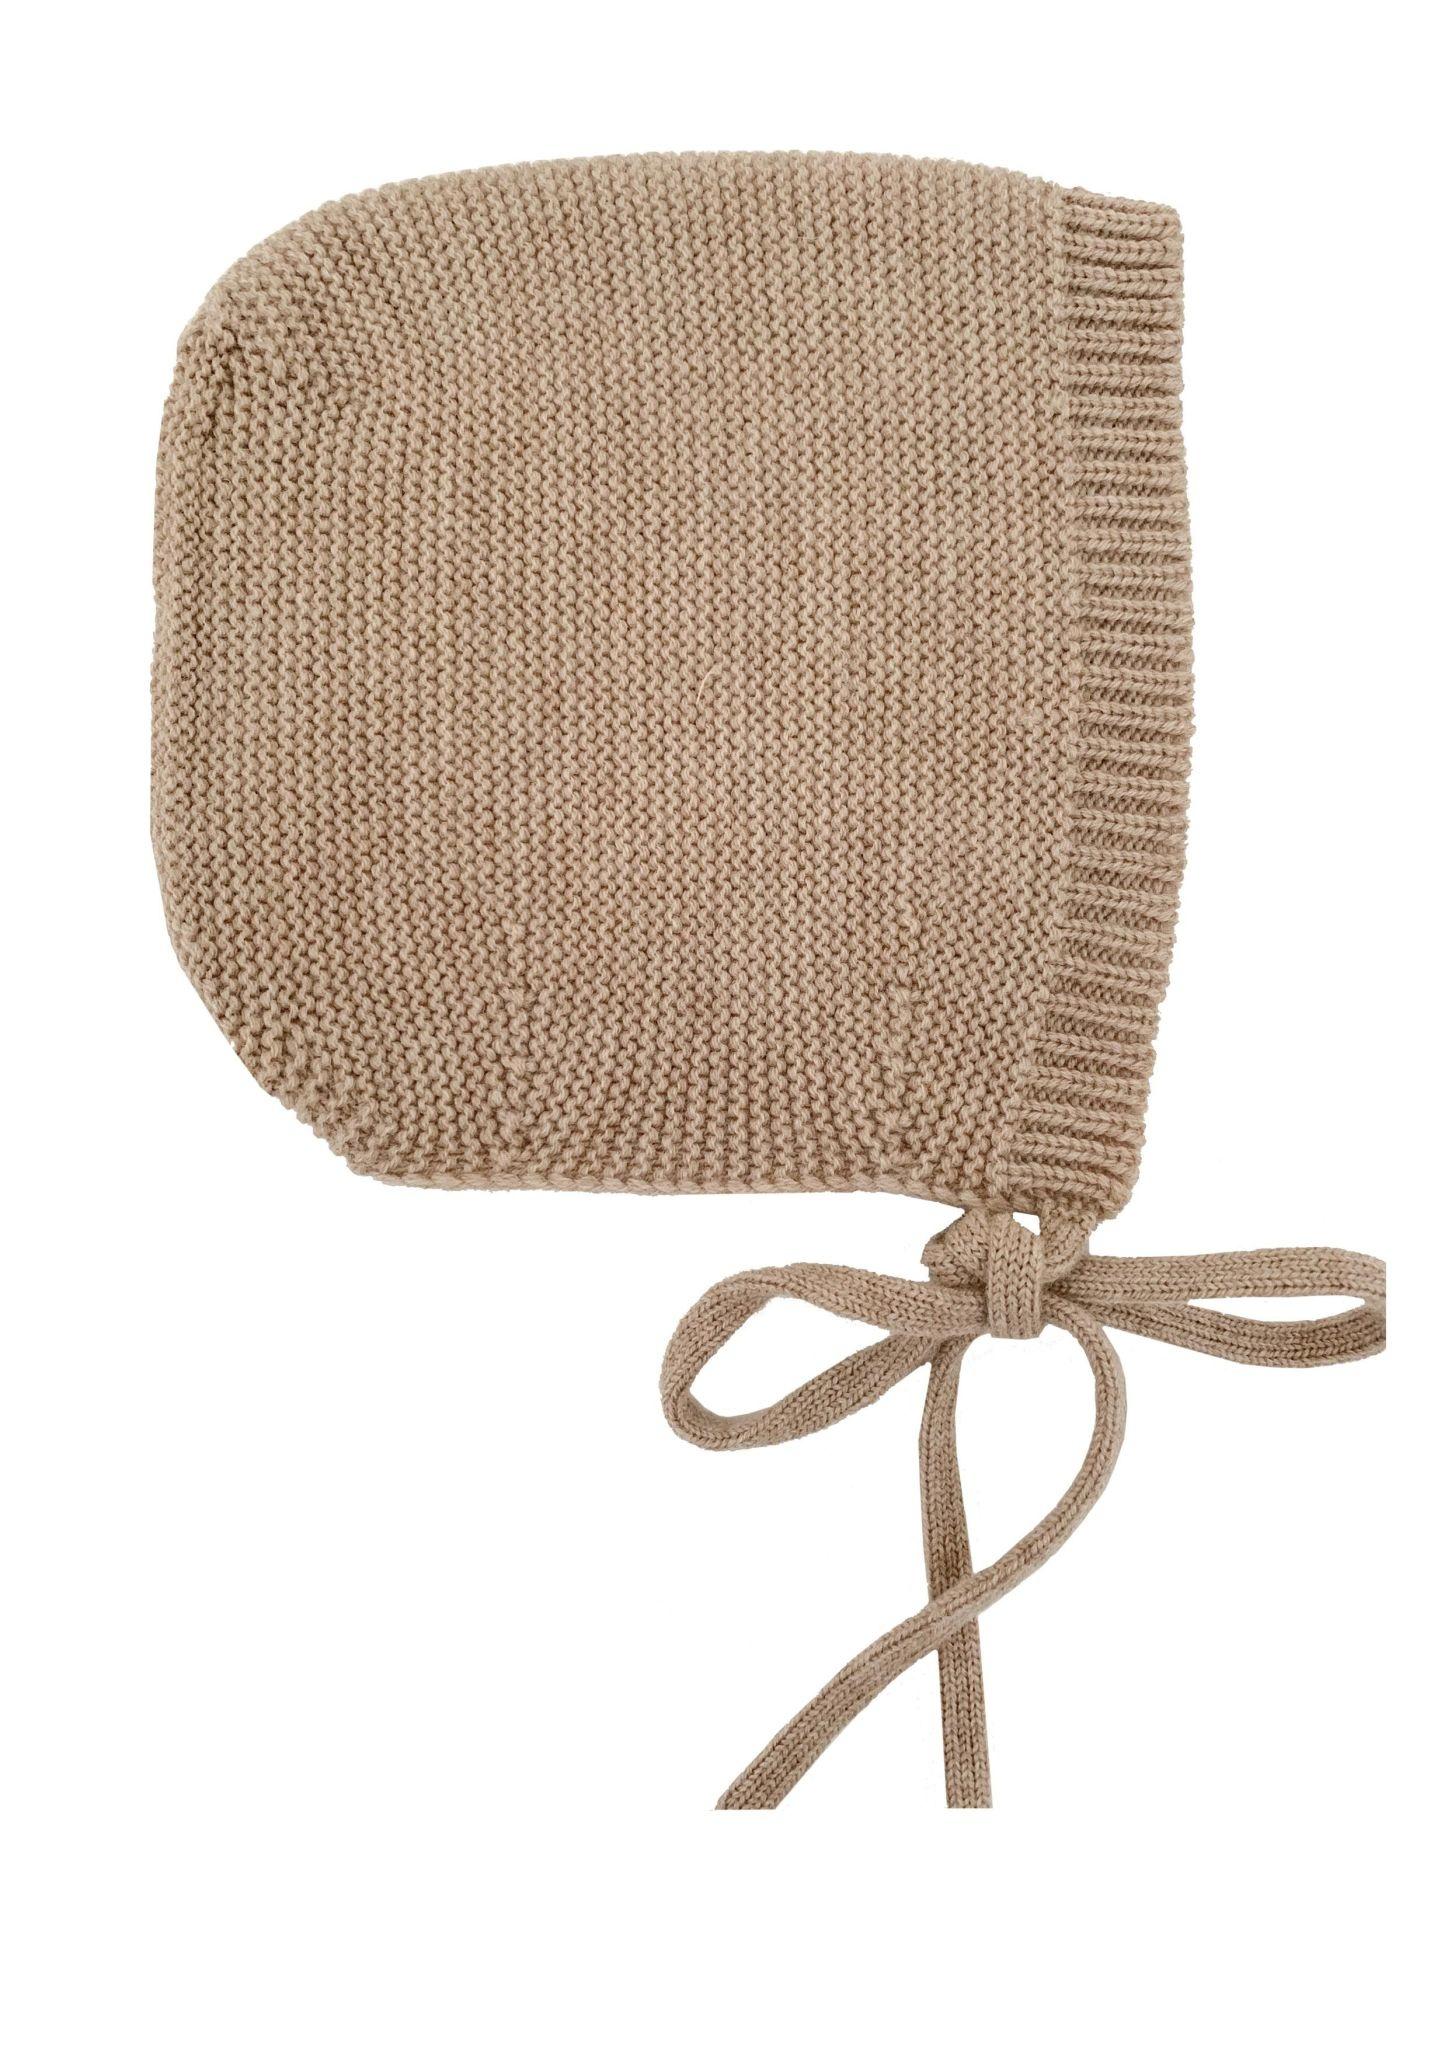 Bonnet dolly sand-1